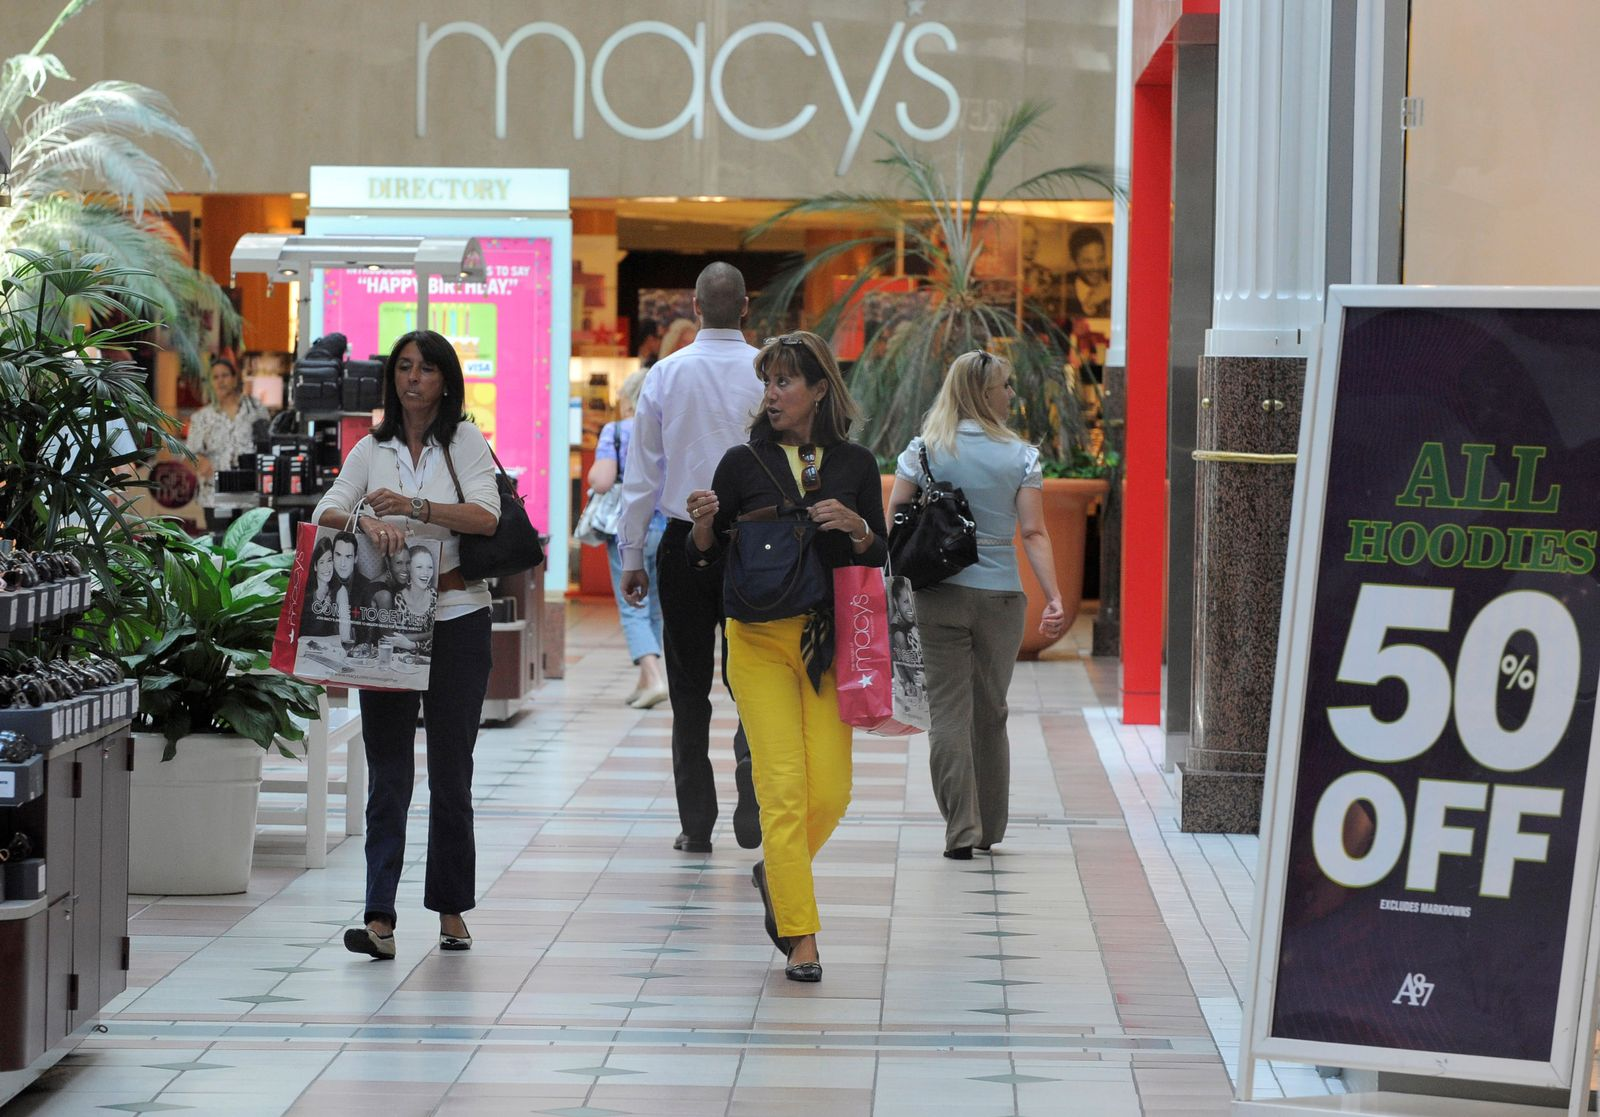 Shopping mall / Einkaufszentrum / USA